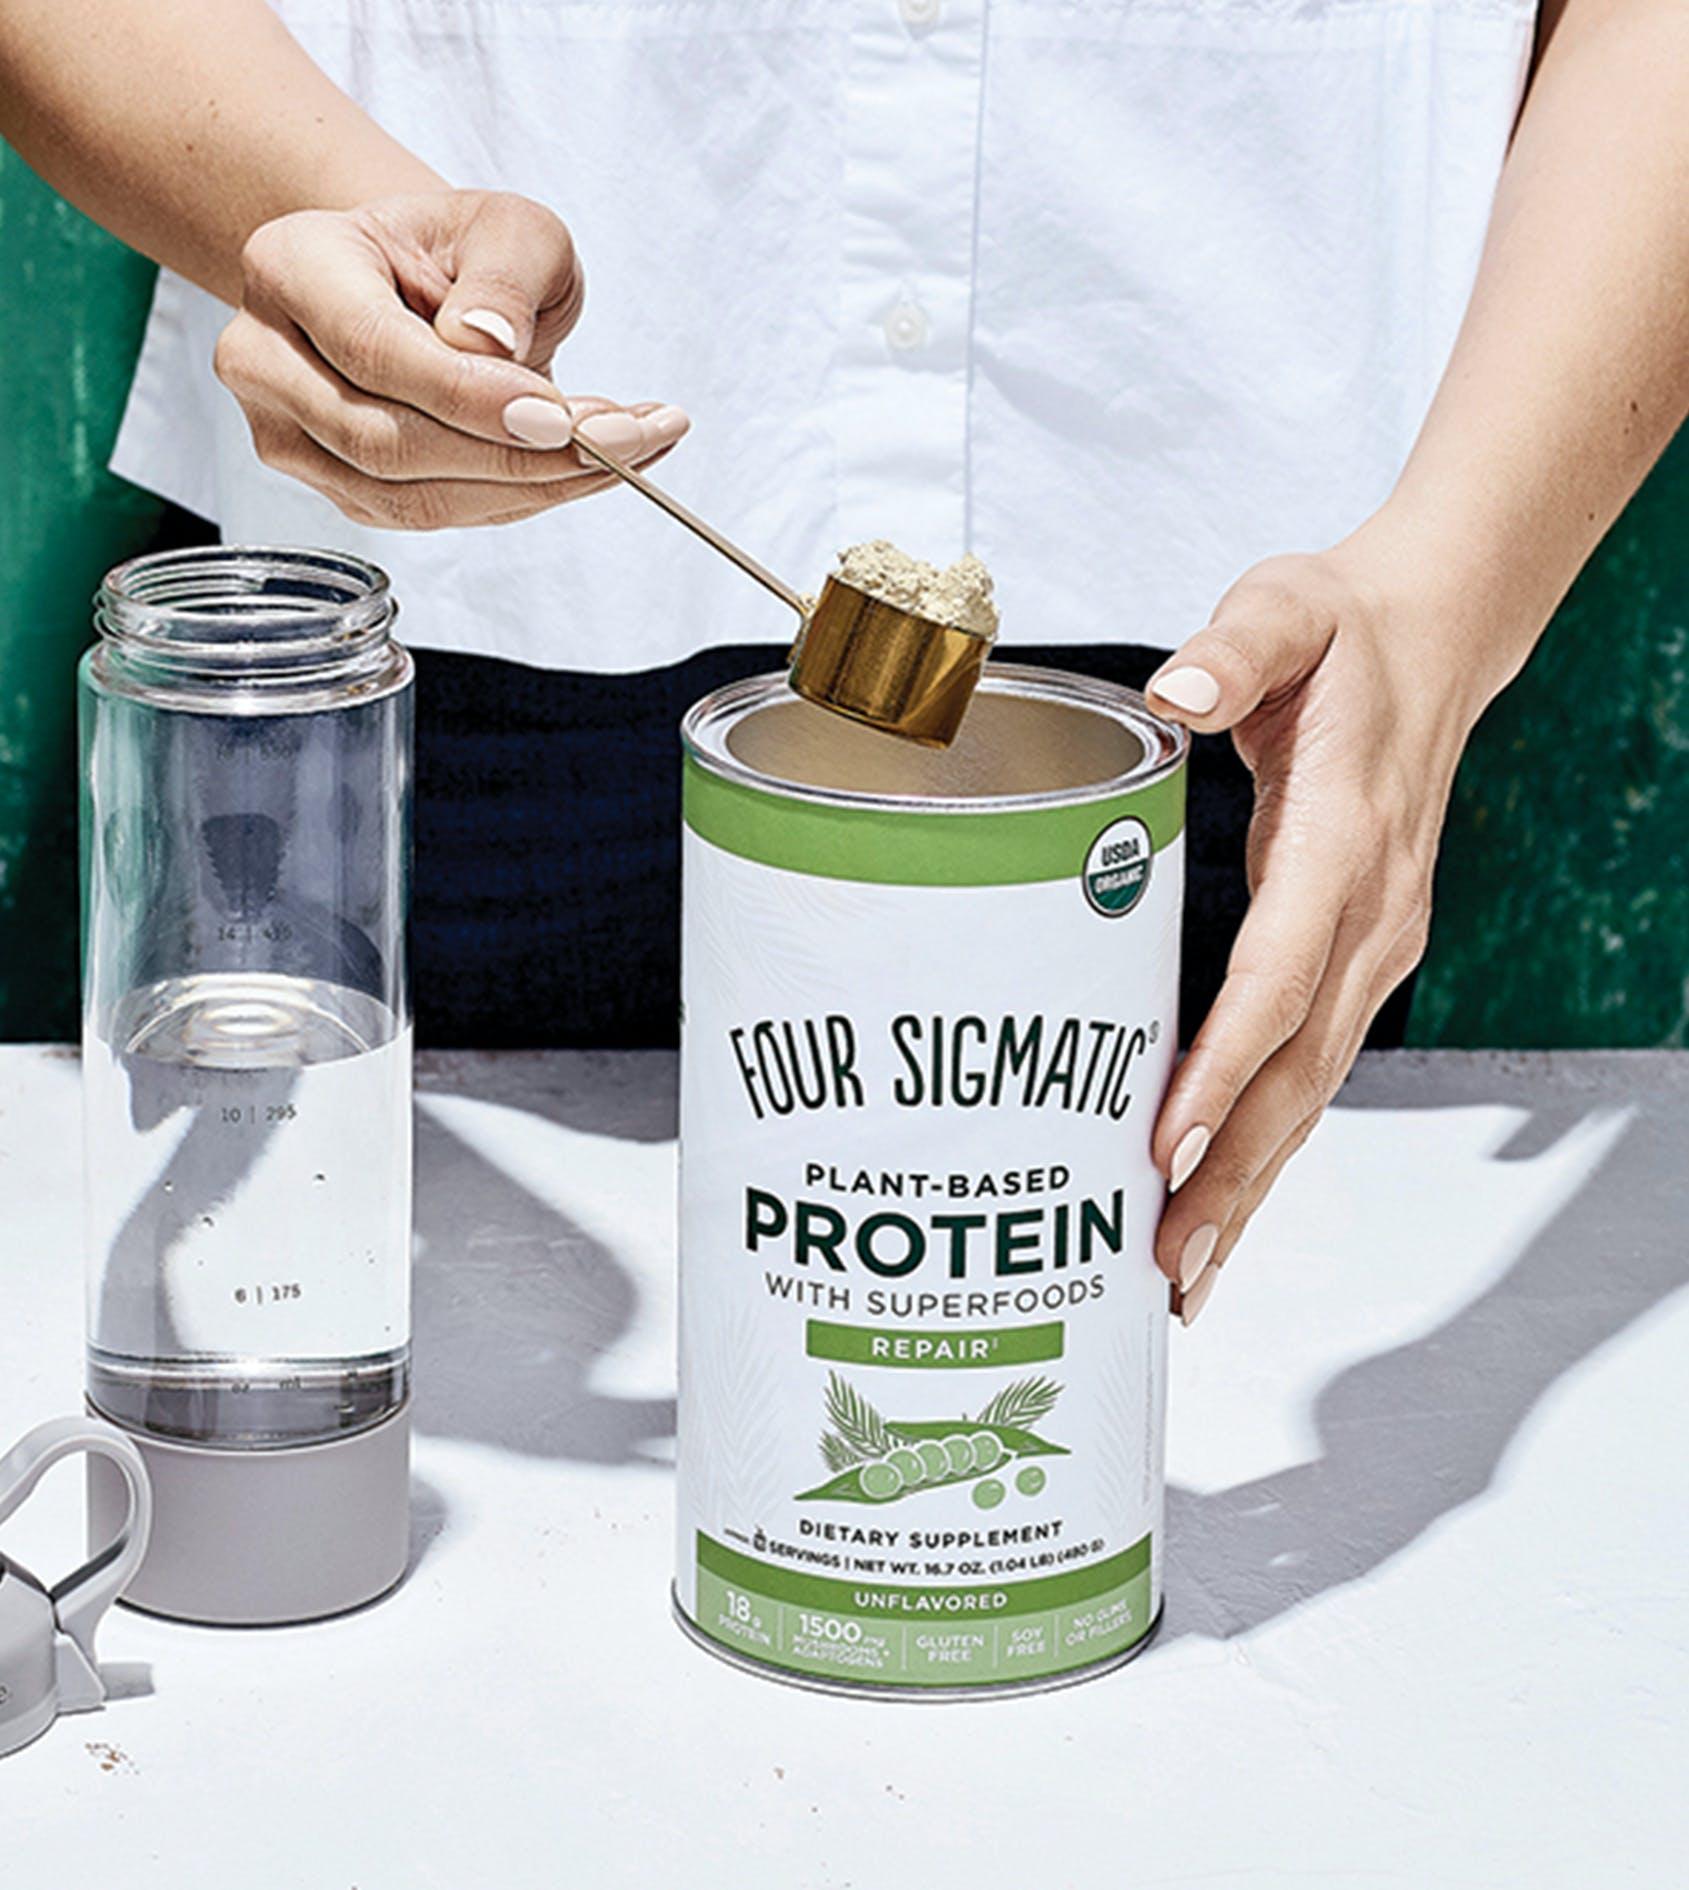 Bulk protein